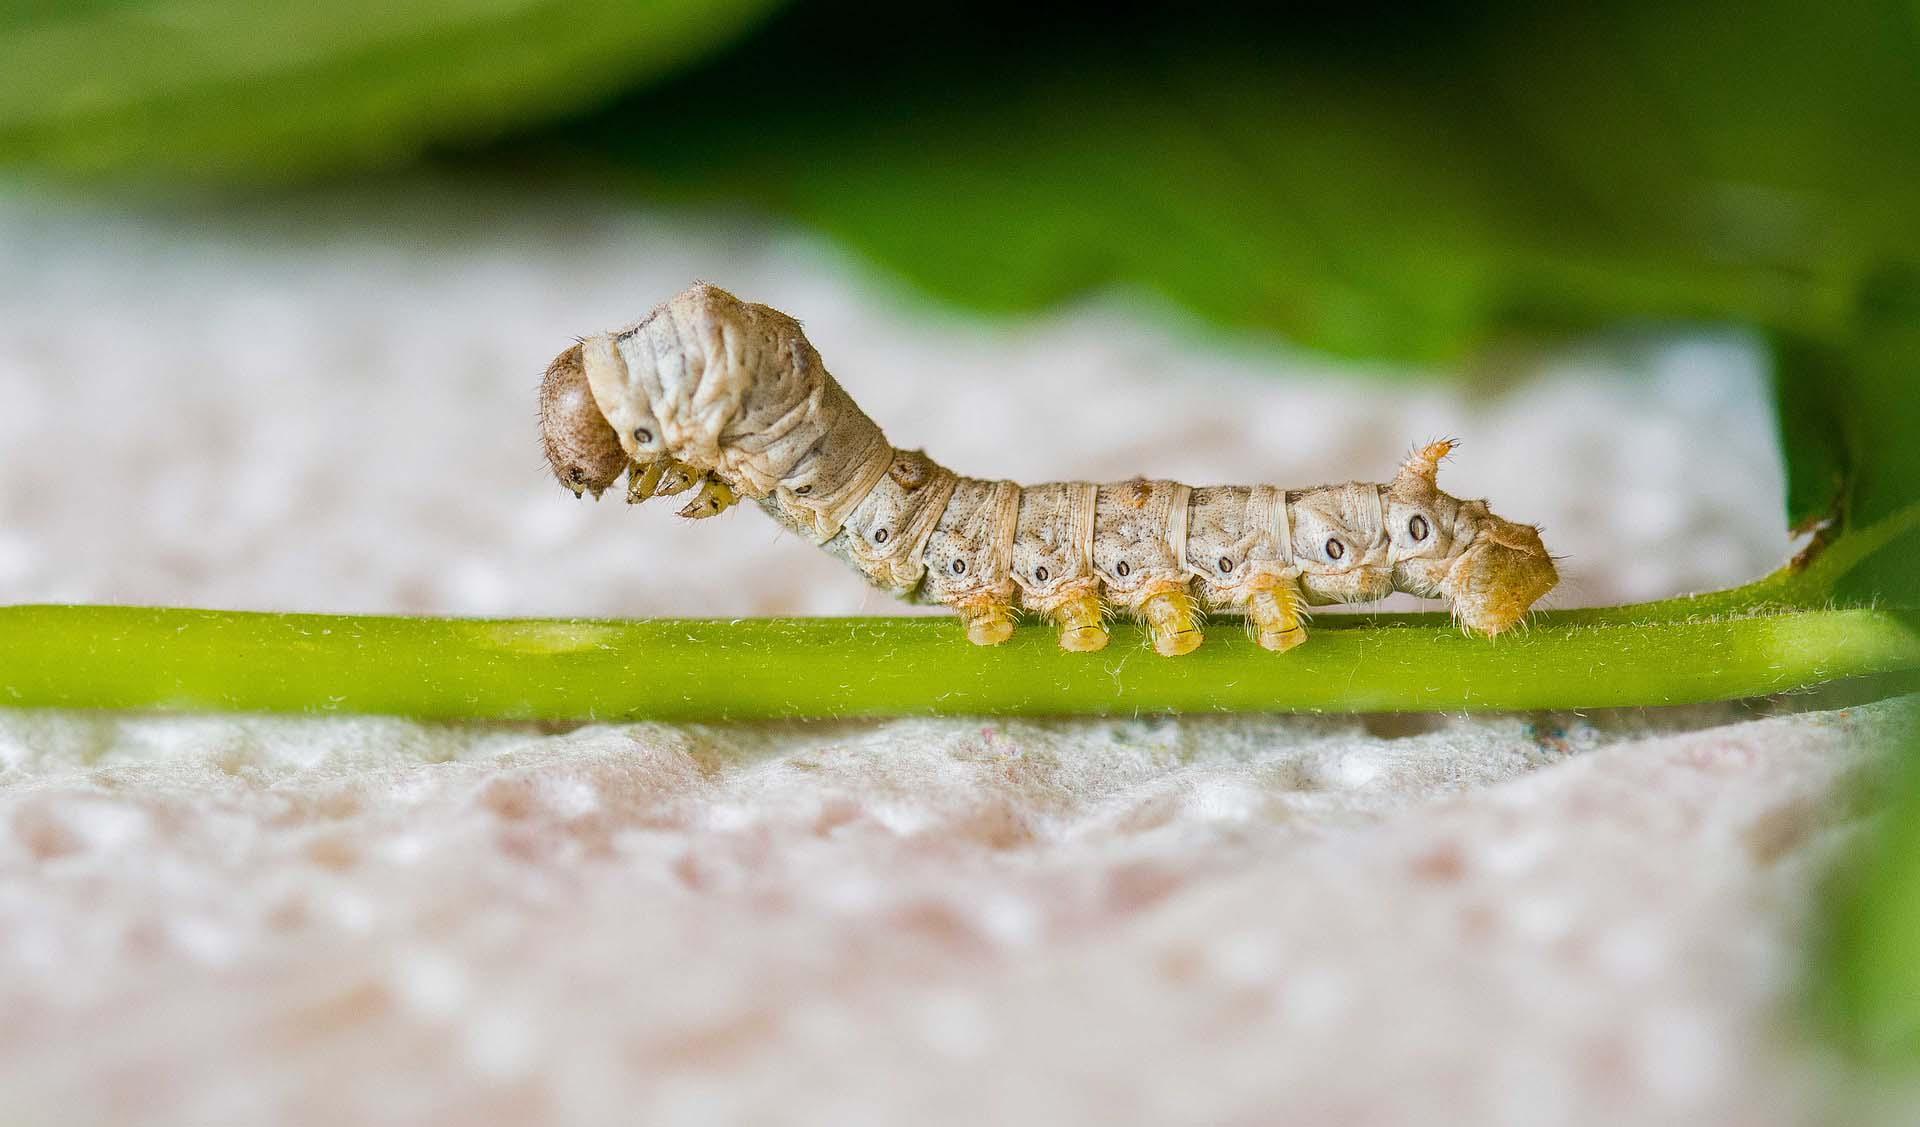 Silkworm sitting on green stem